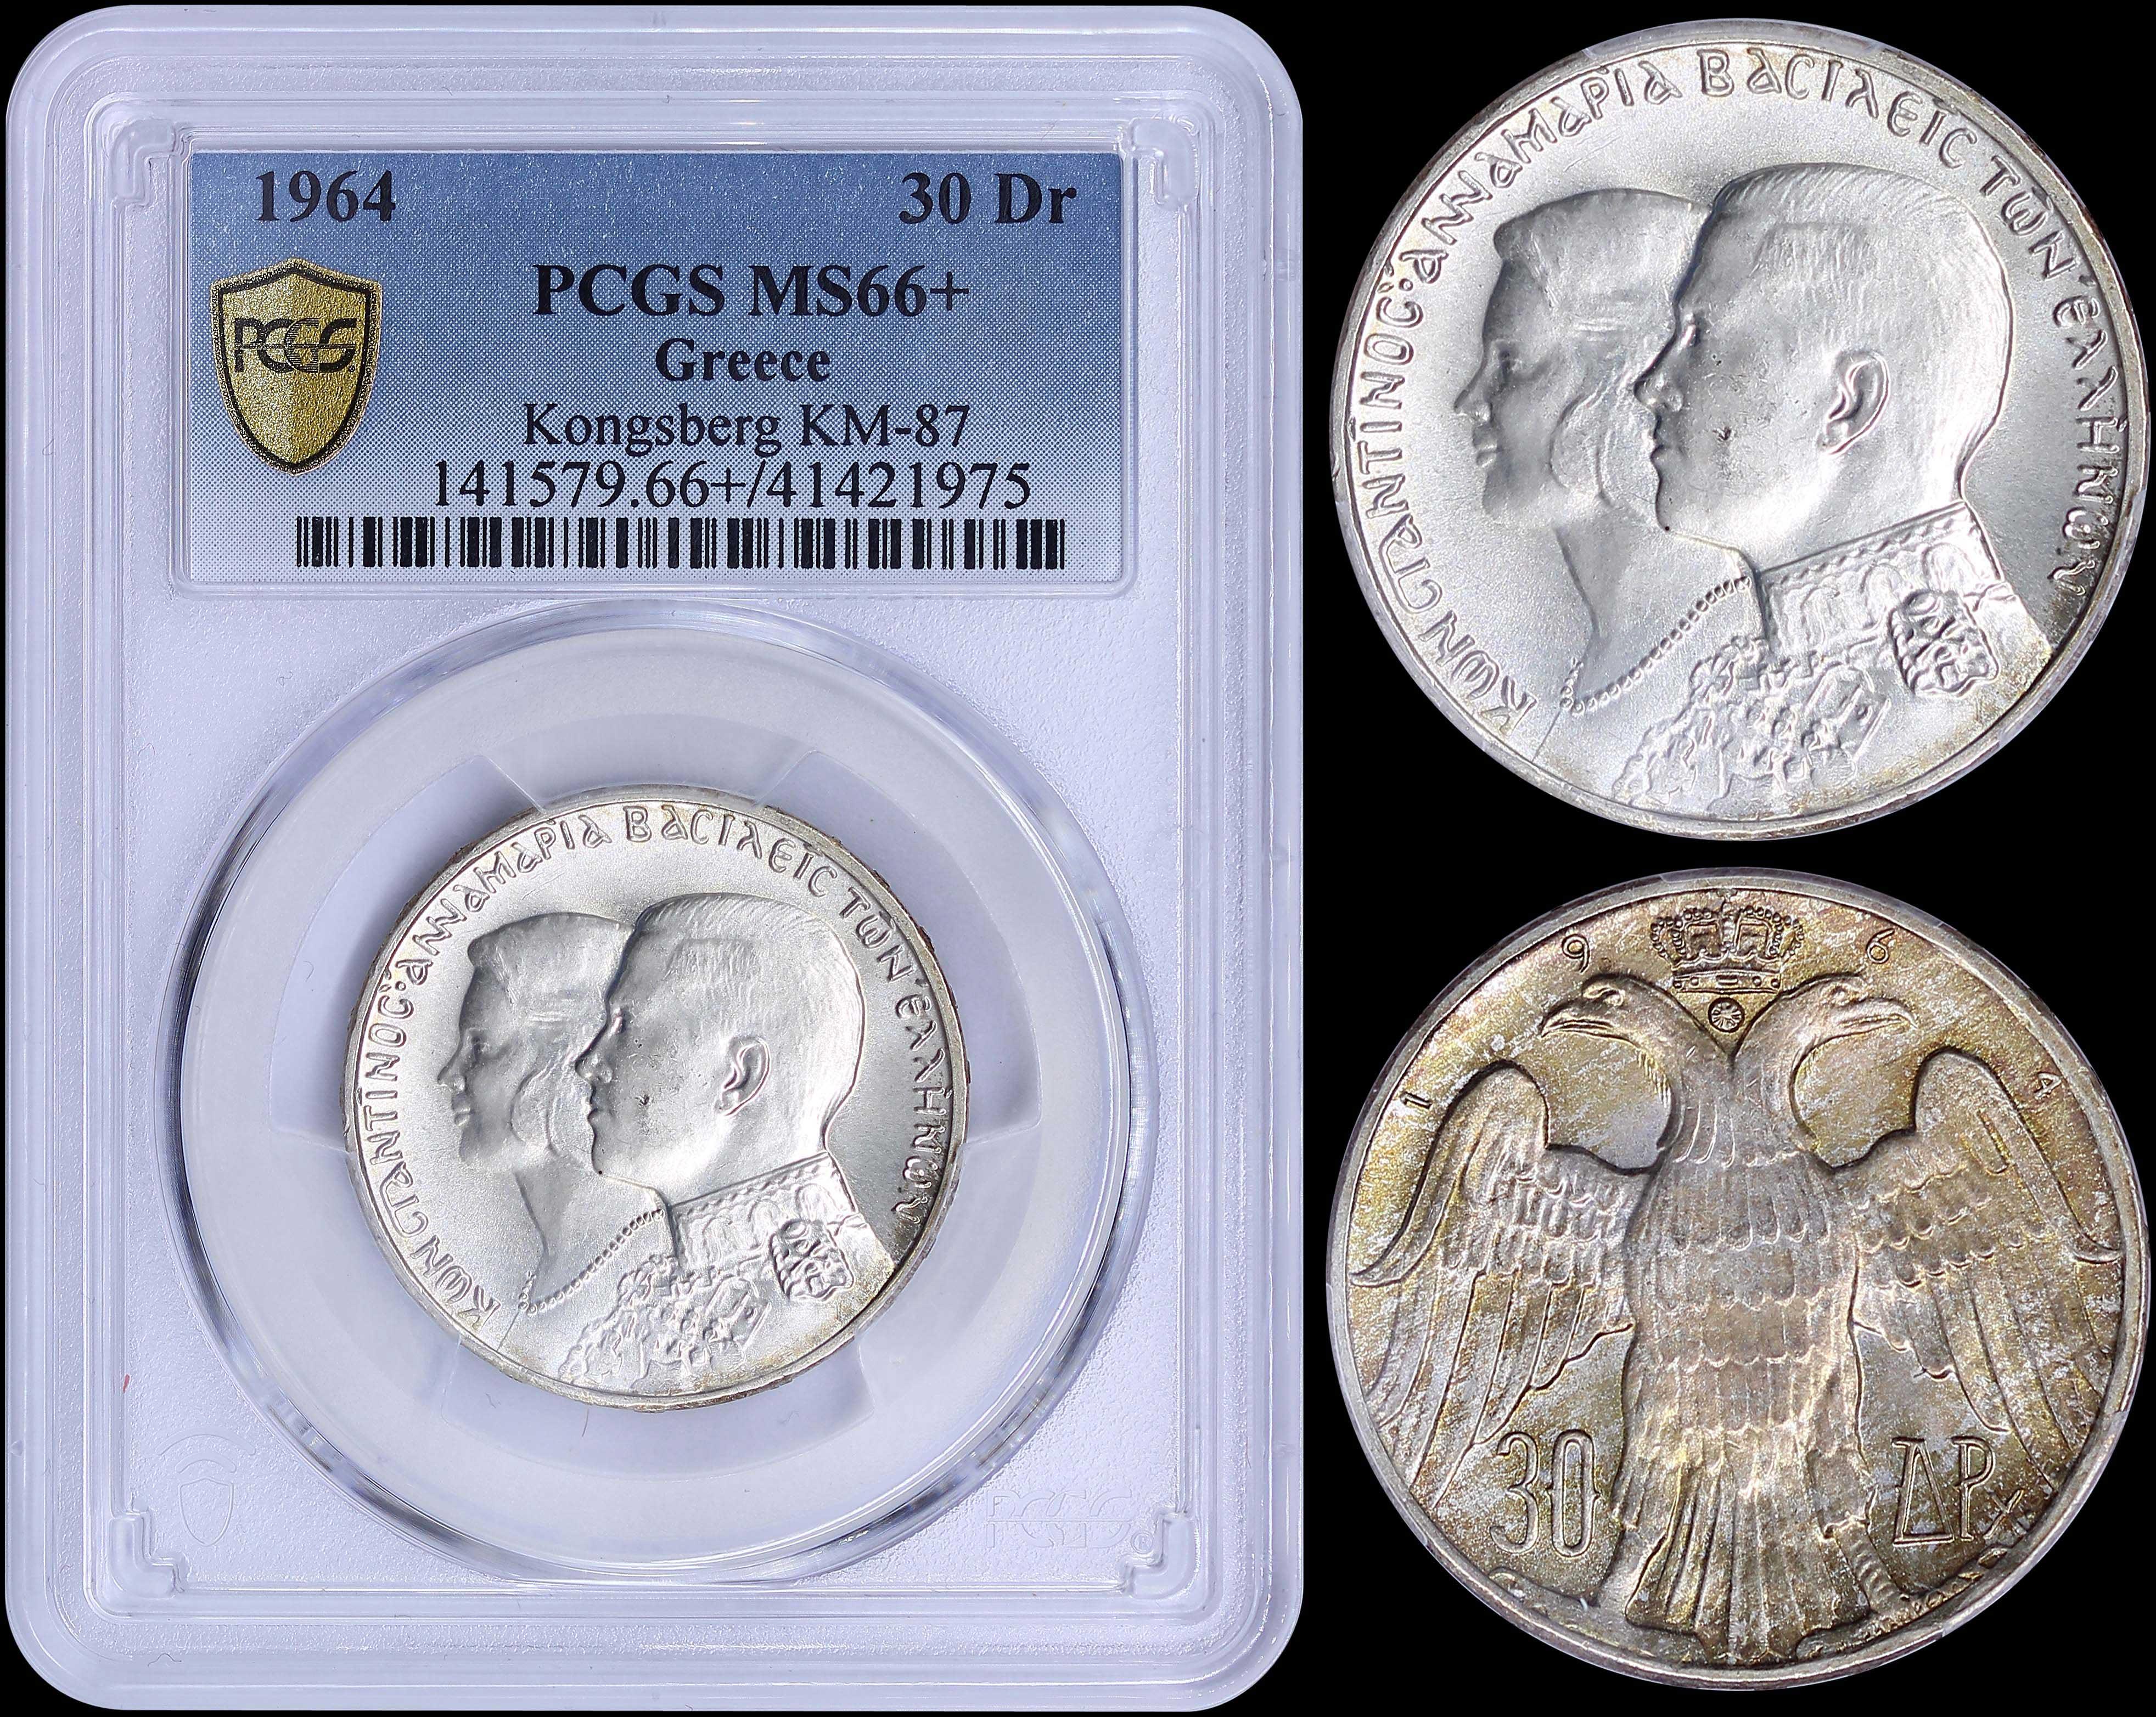 Lot 6139 - -  COINS & TOKENS king constantine ii -  A. Karamitsos Public & Live Internet Auction 682 (Part A) Coins, Medals & Banknotes